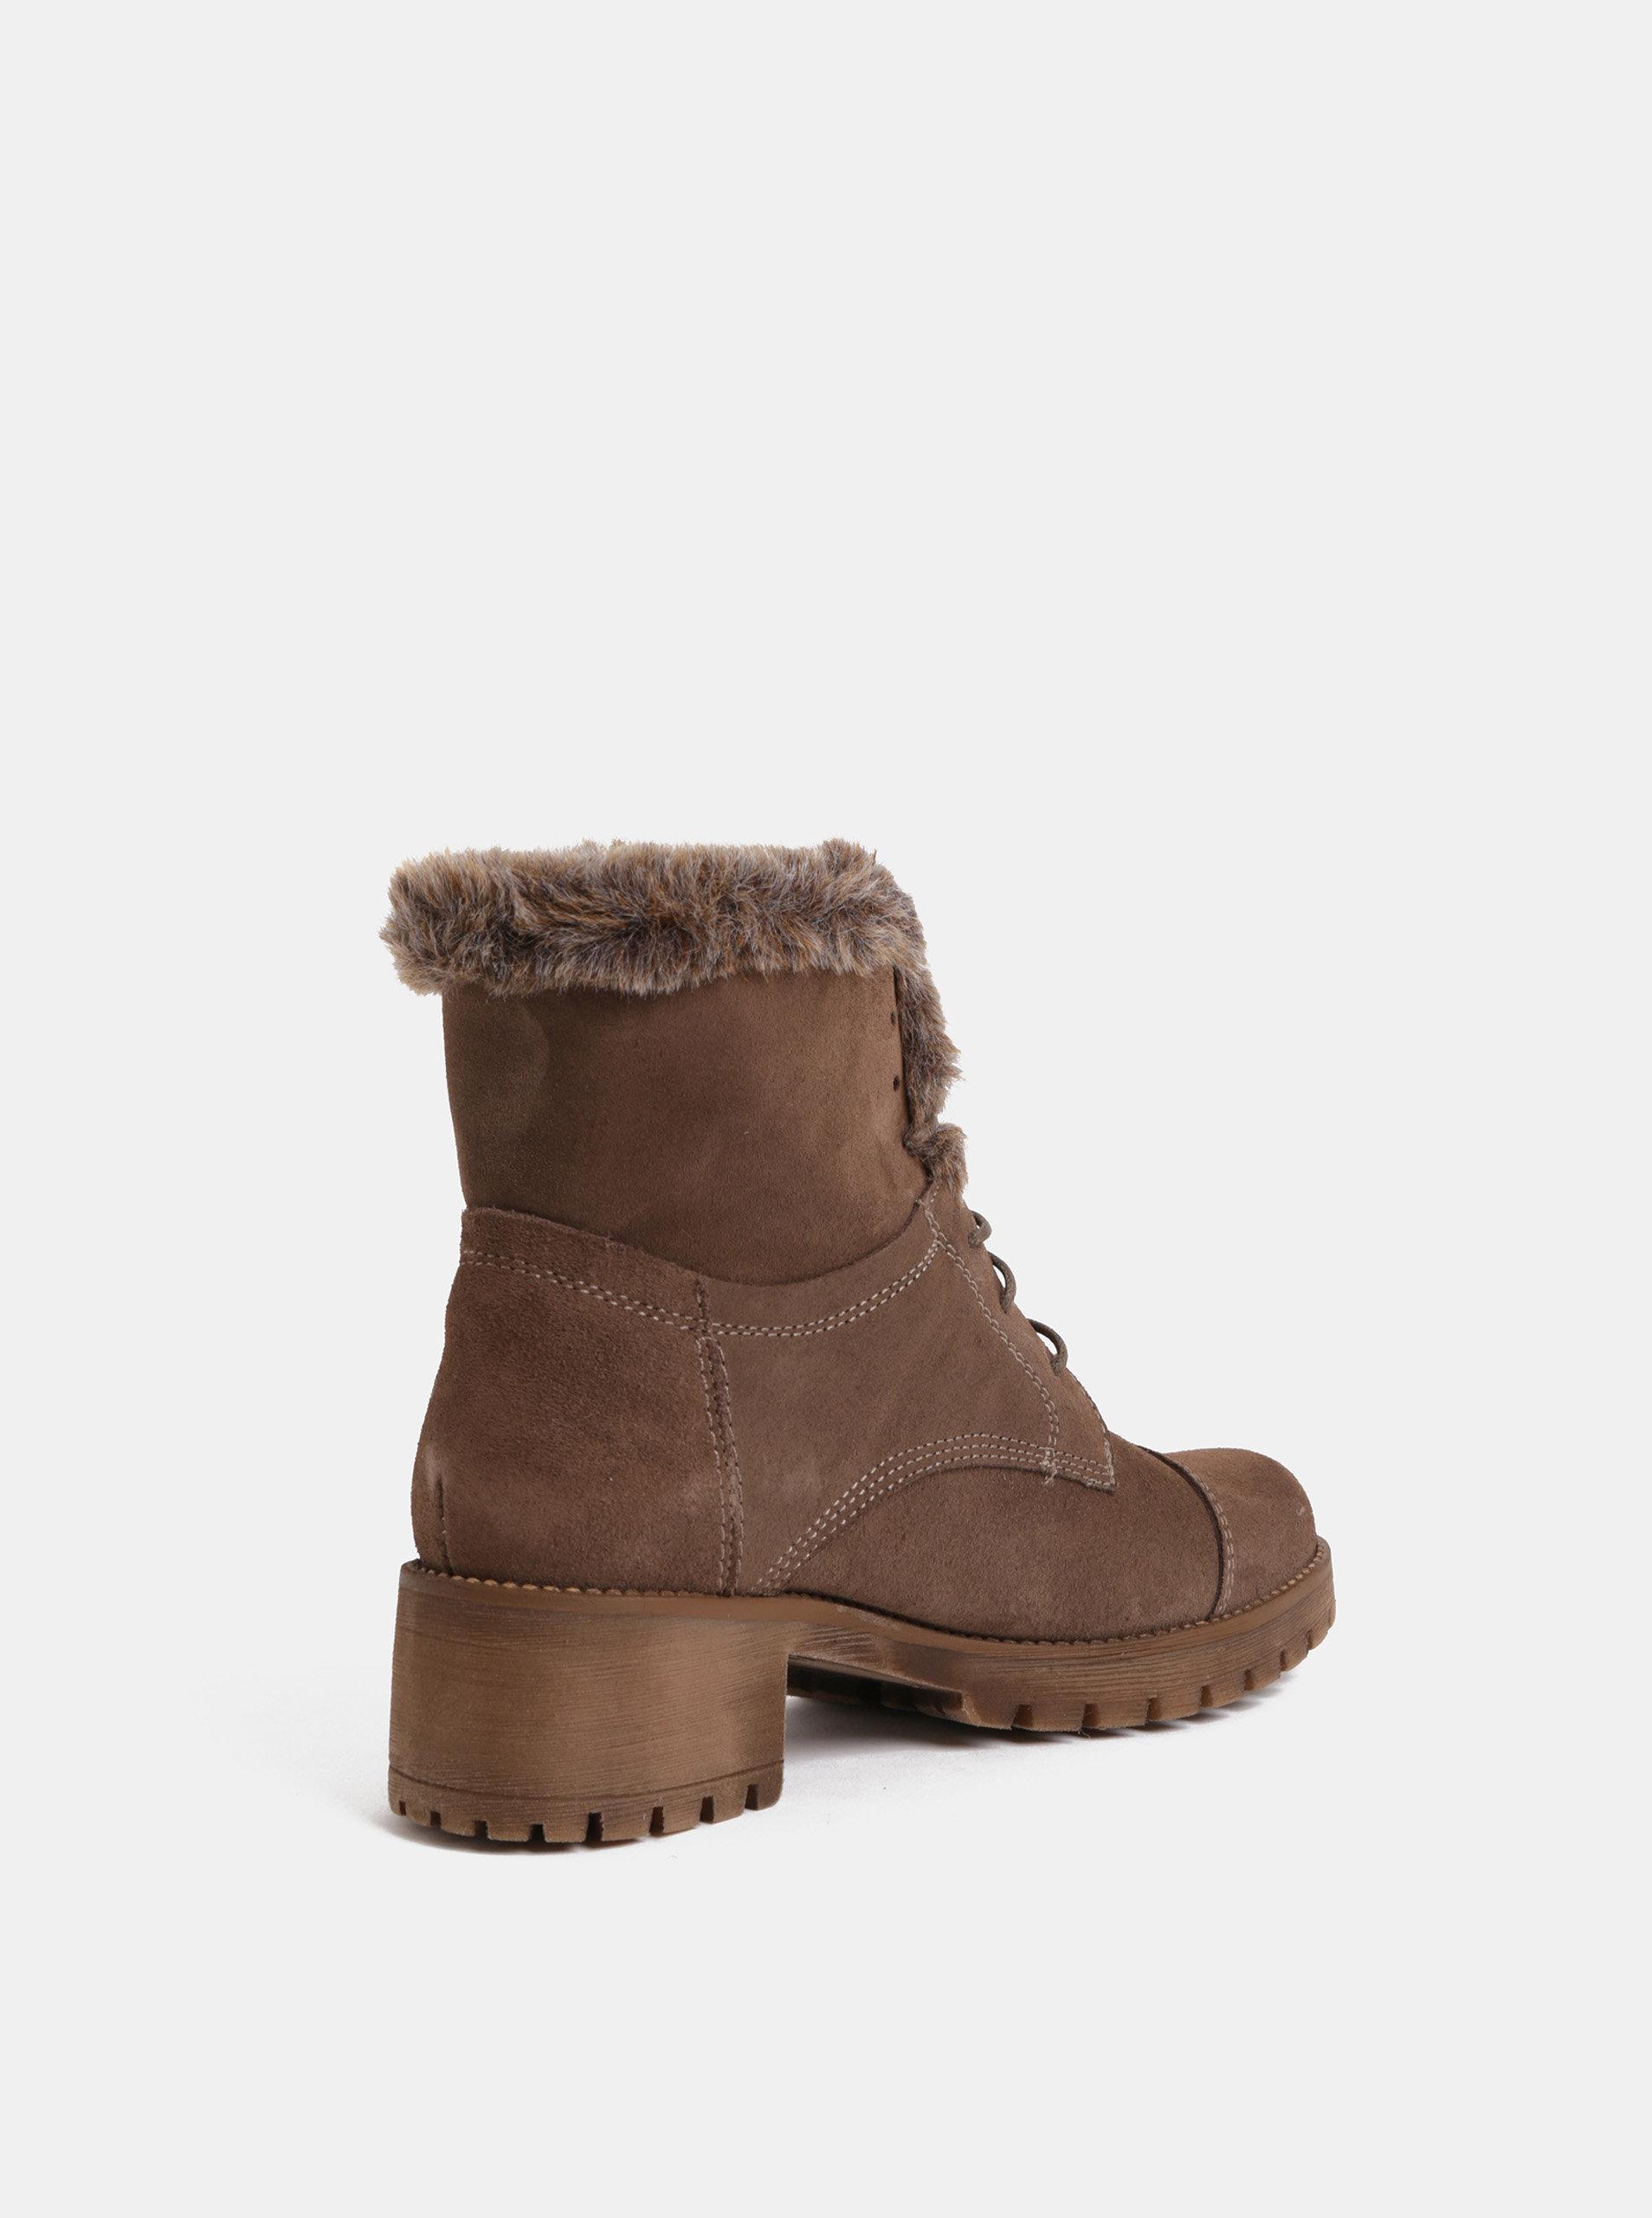 e835ea587736 Hnedé semišové členkové topánky s umelou kožušinkou OJJU ...